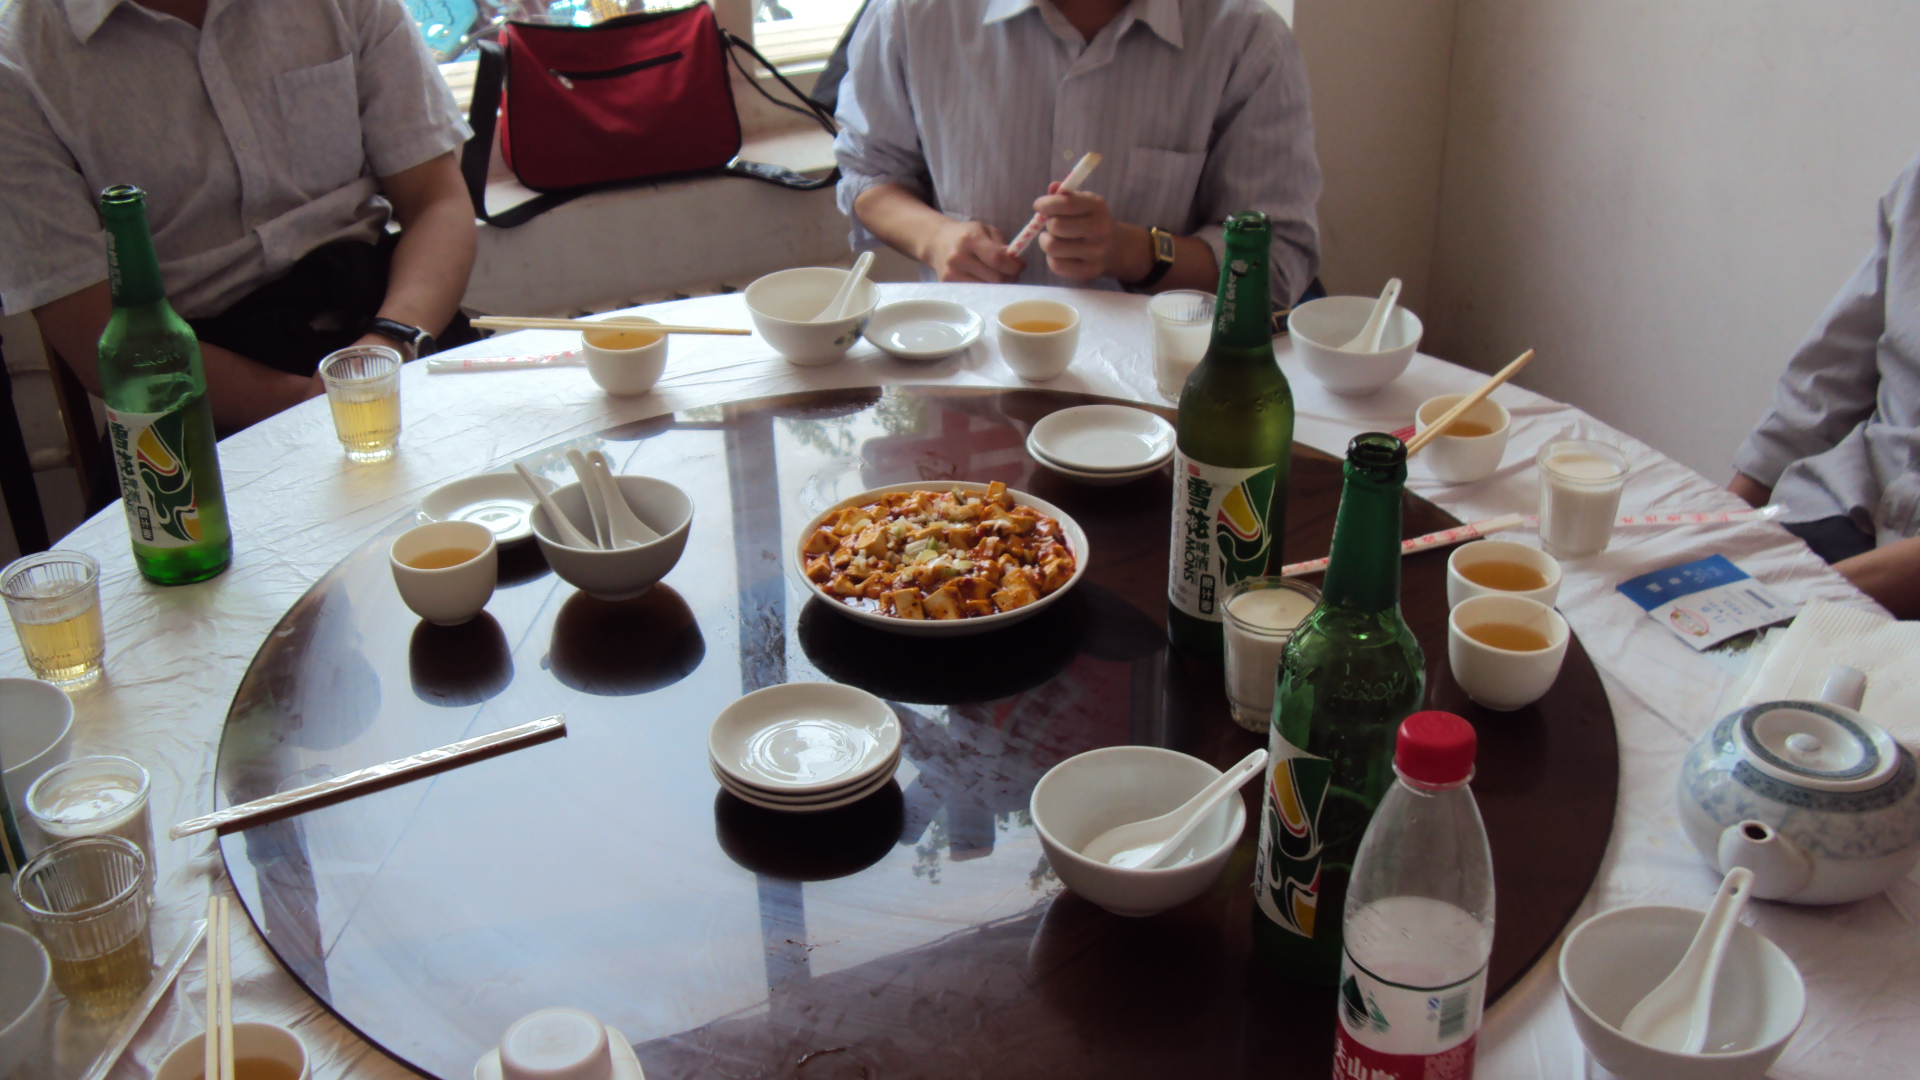 Table tournante dans restaurant chinois